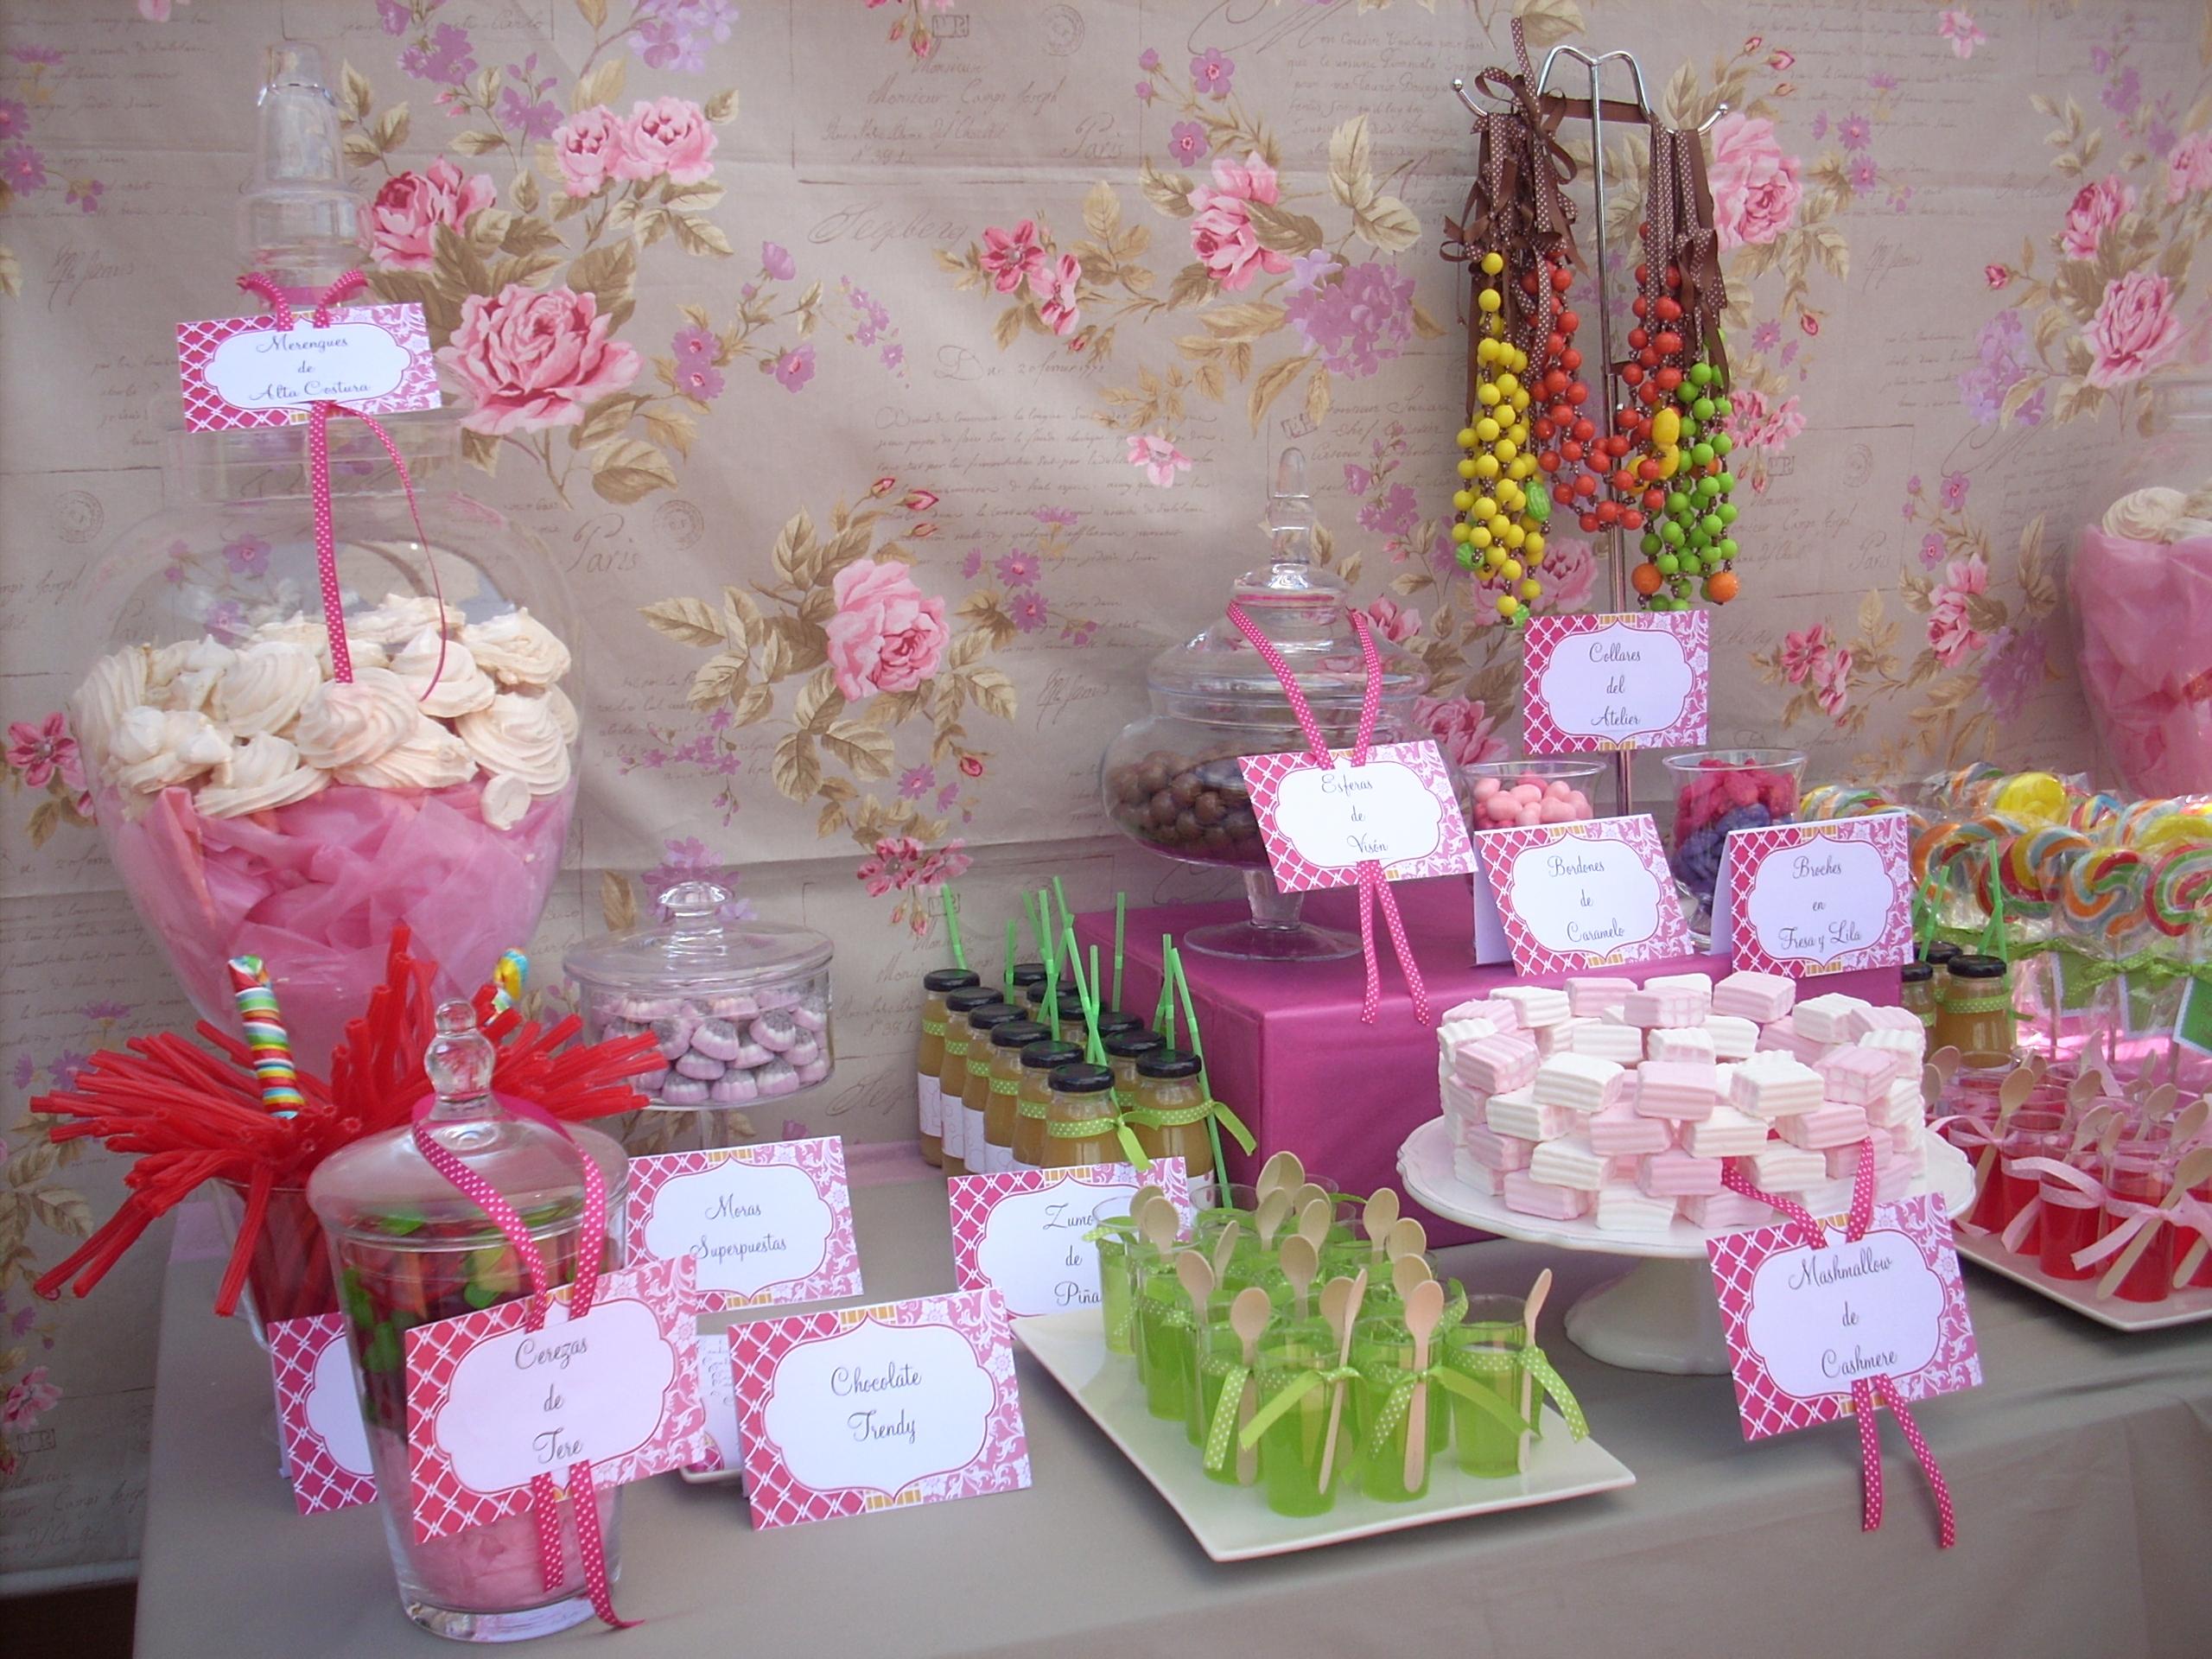 Sweet in a box una empresa muy dulce linnet events - Ideas para decorar despacho abogados ...